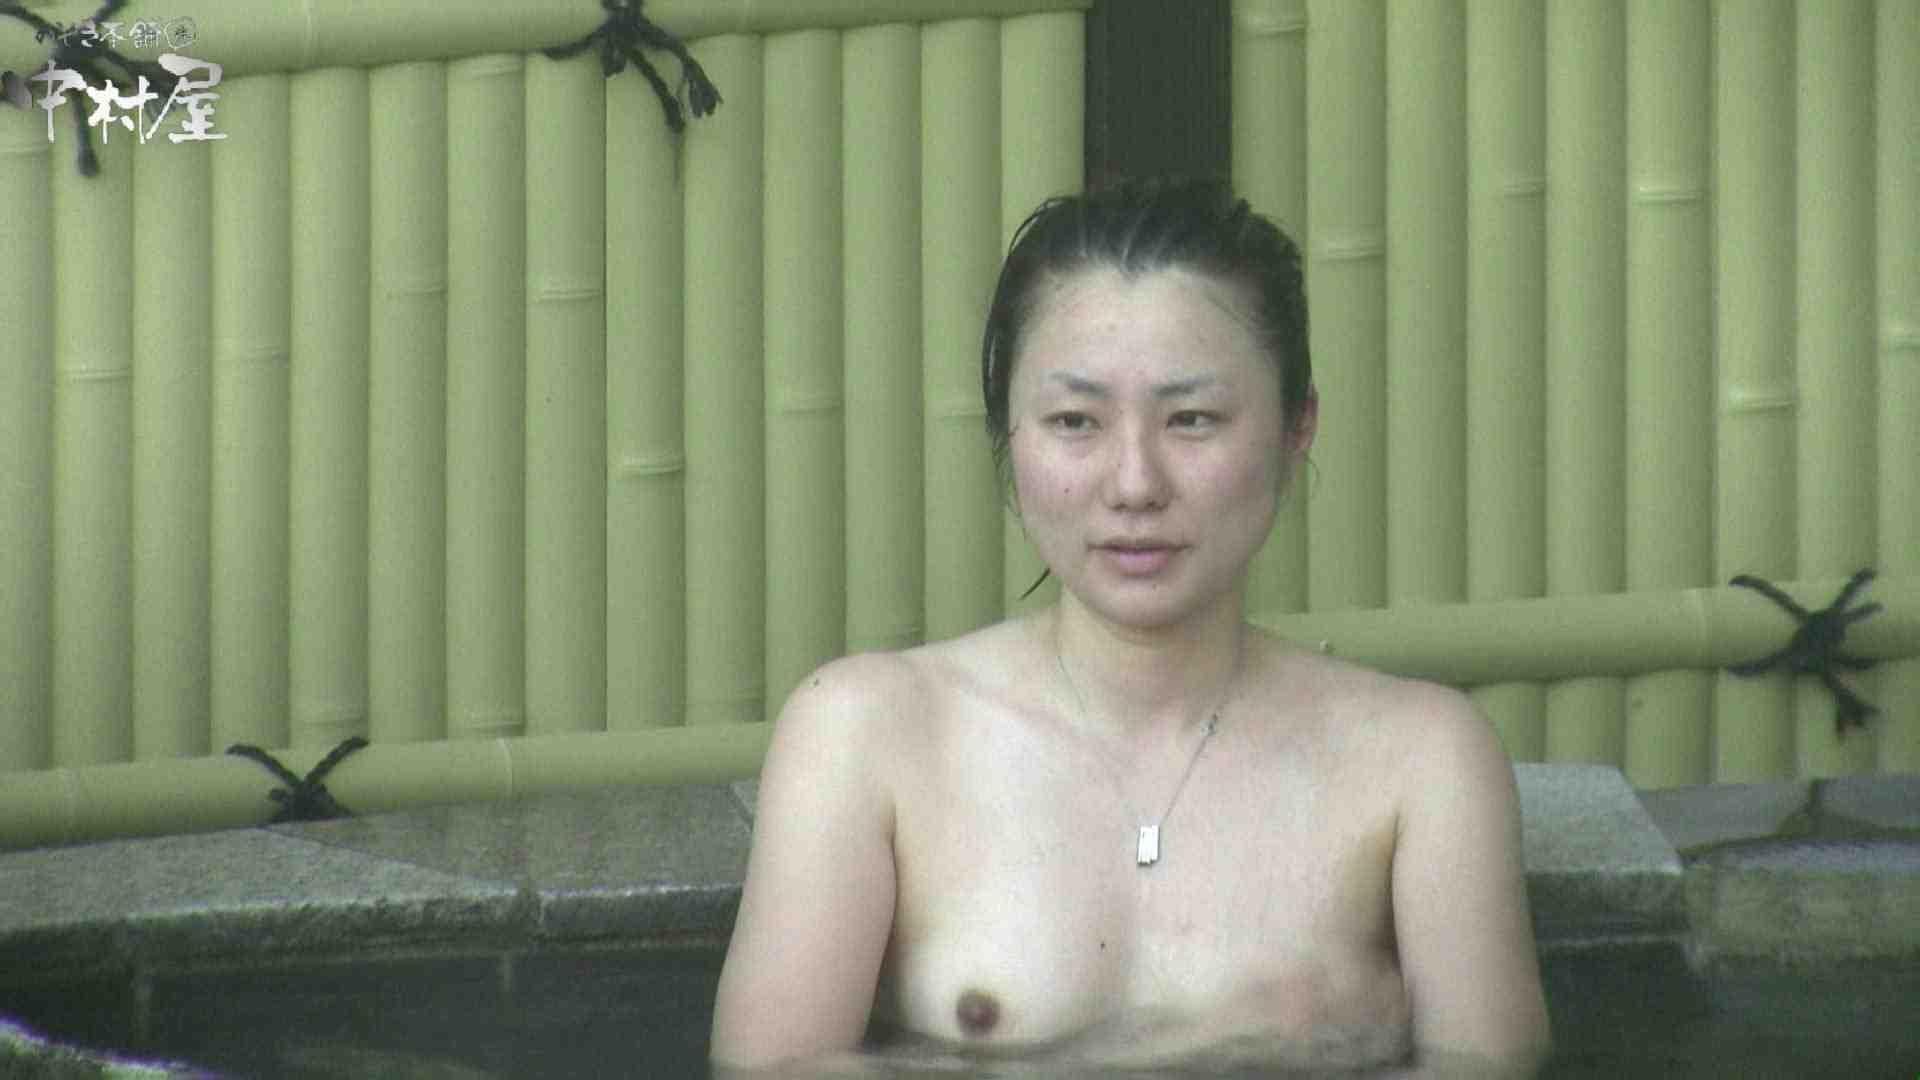 Aquaな露天風呂Vol.969 盗撮 | OLセックス  52画像 16